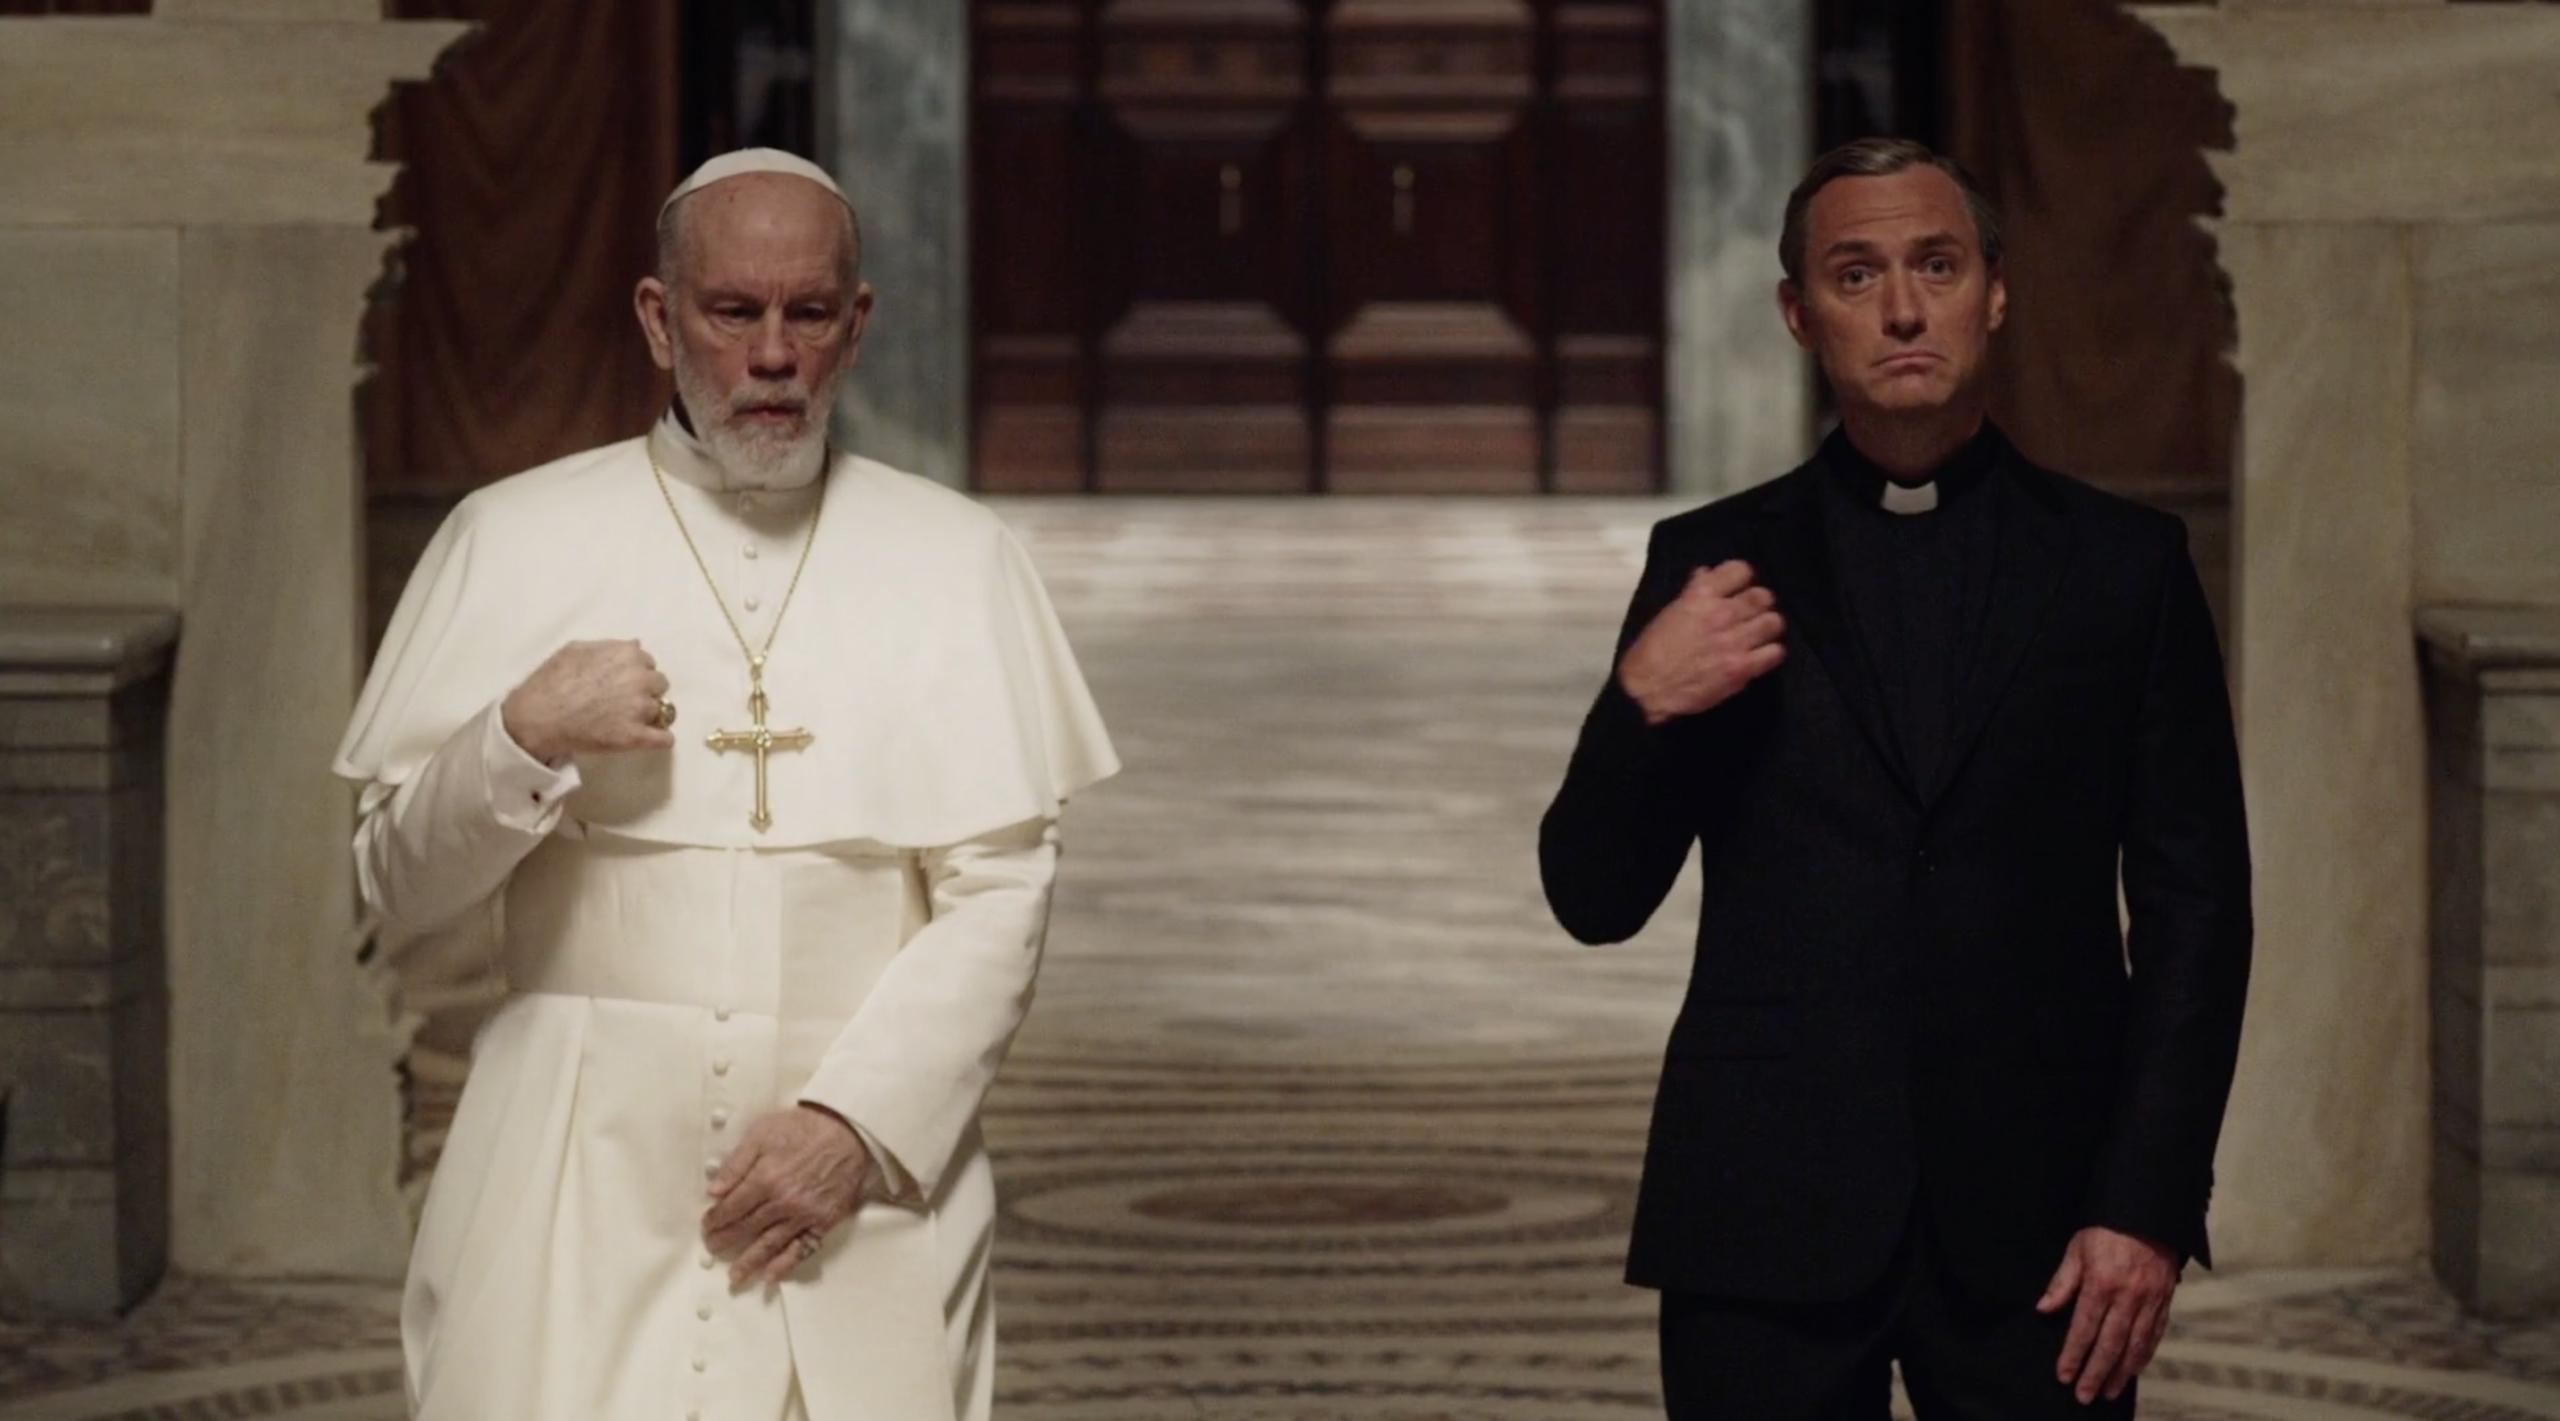 lenny and john new pope